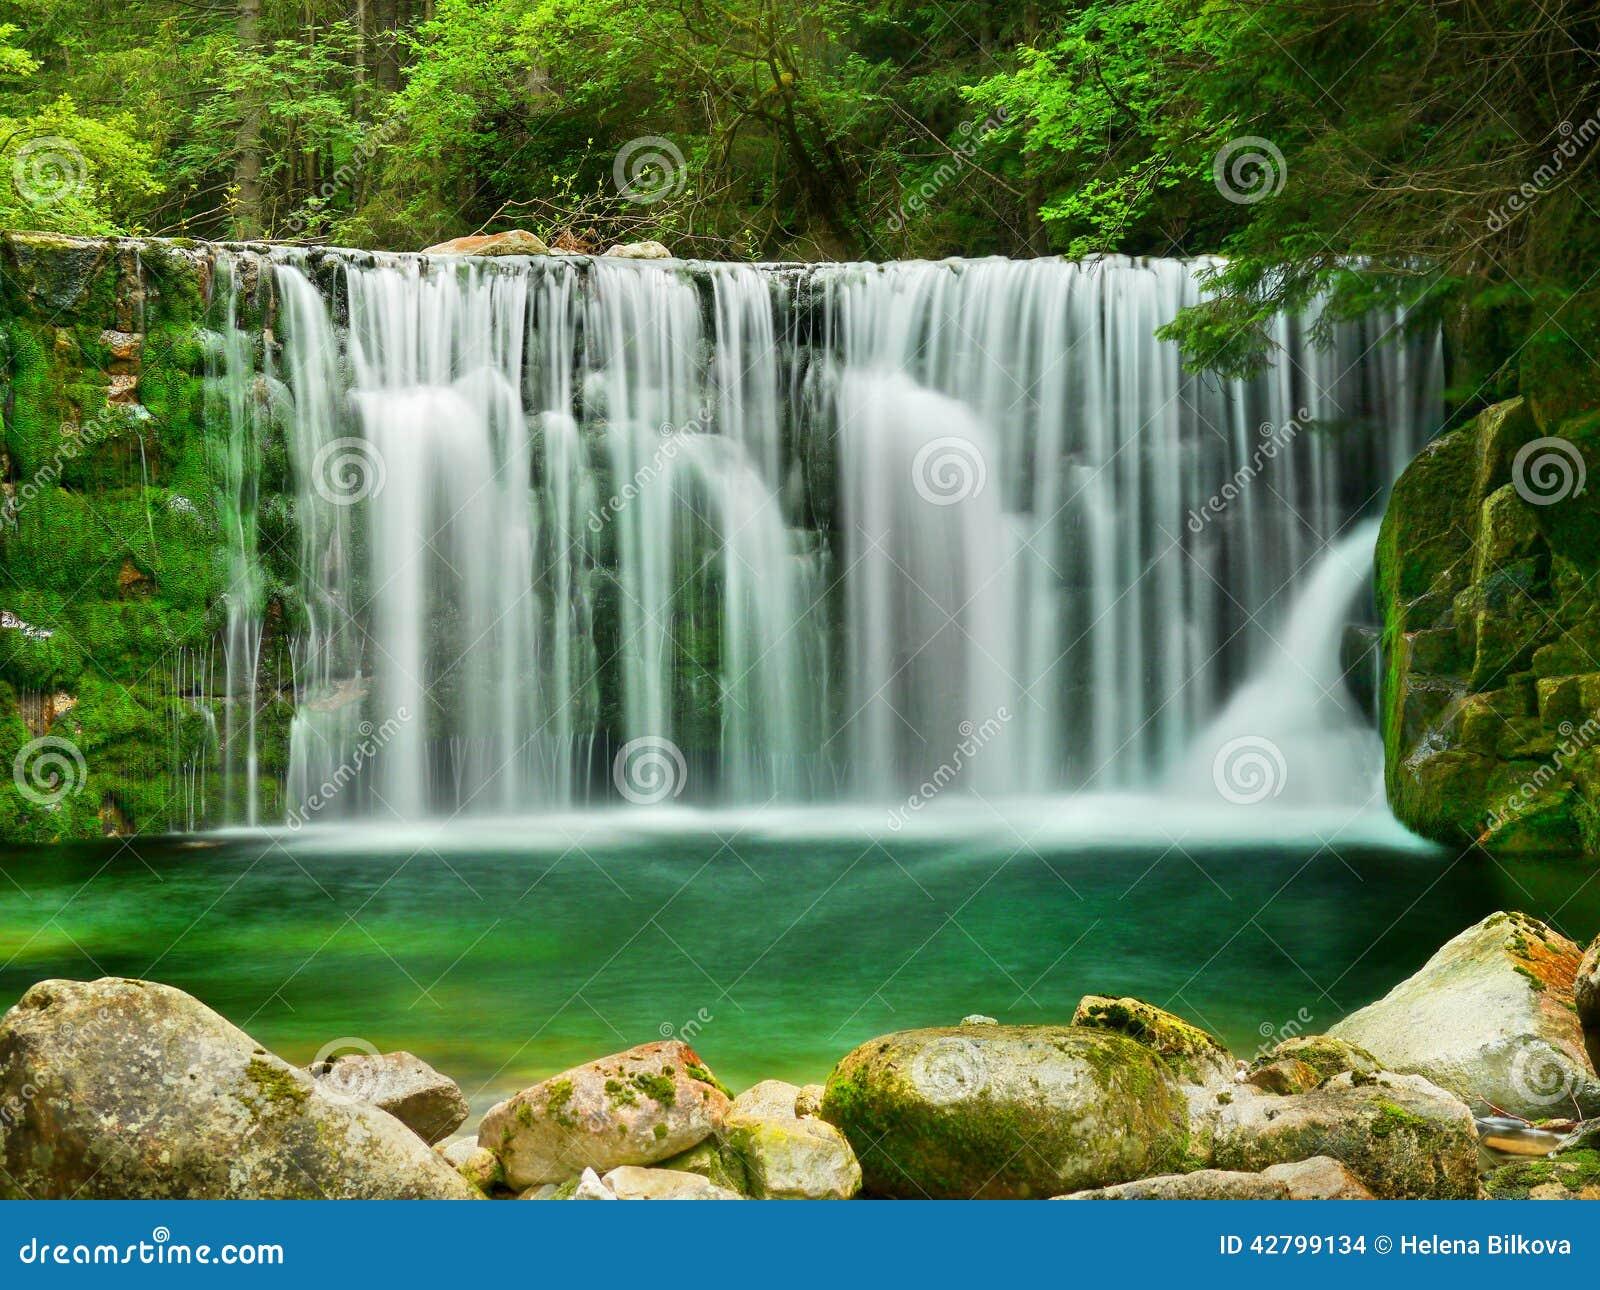 Lake Emerald Waterfalls Forest Landscape Stock Photo